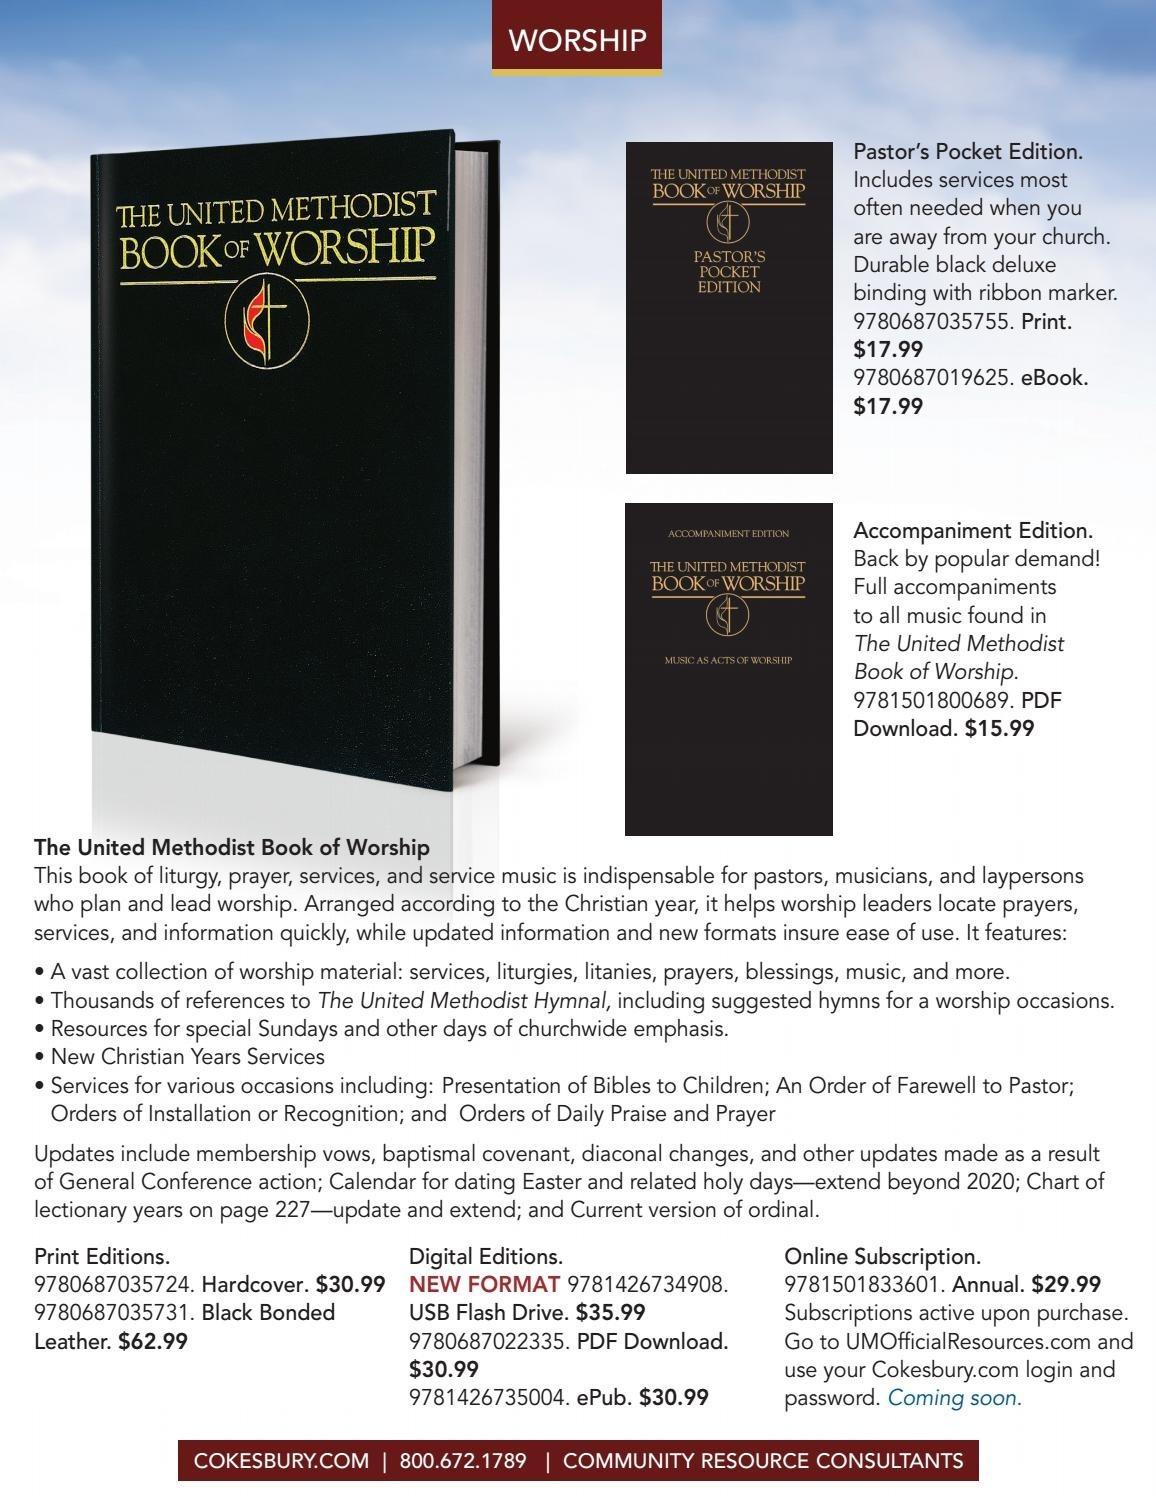 Methodist Lectionary Calendar 2020 - Template Calendar Design  Lectionary Readings 2021 United Methodist